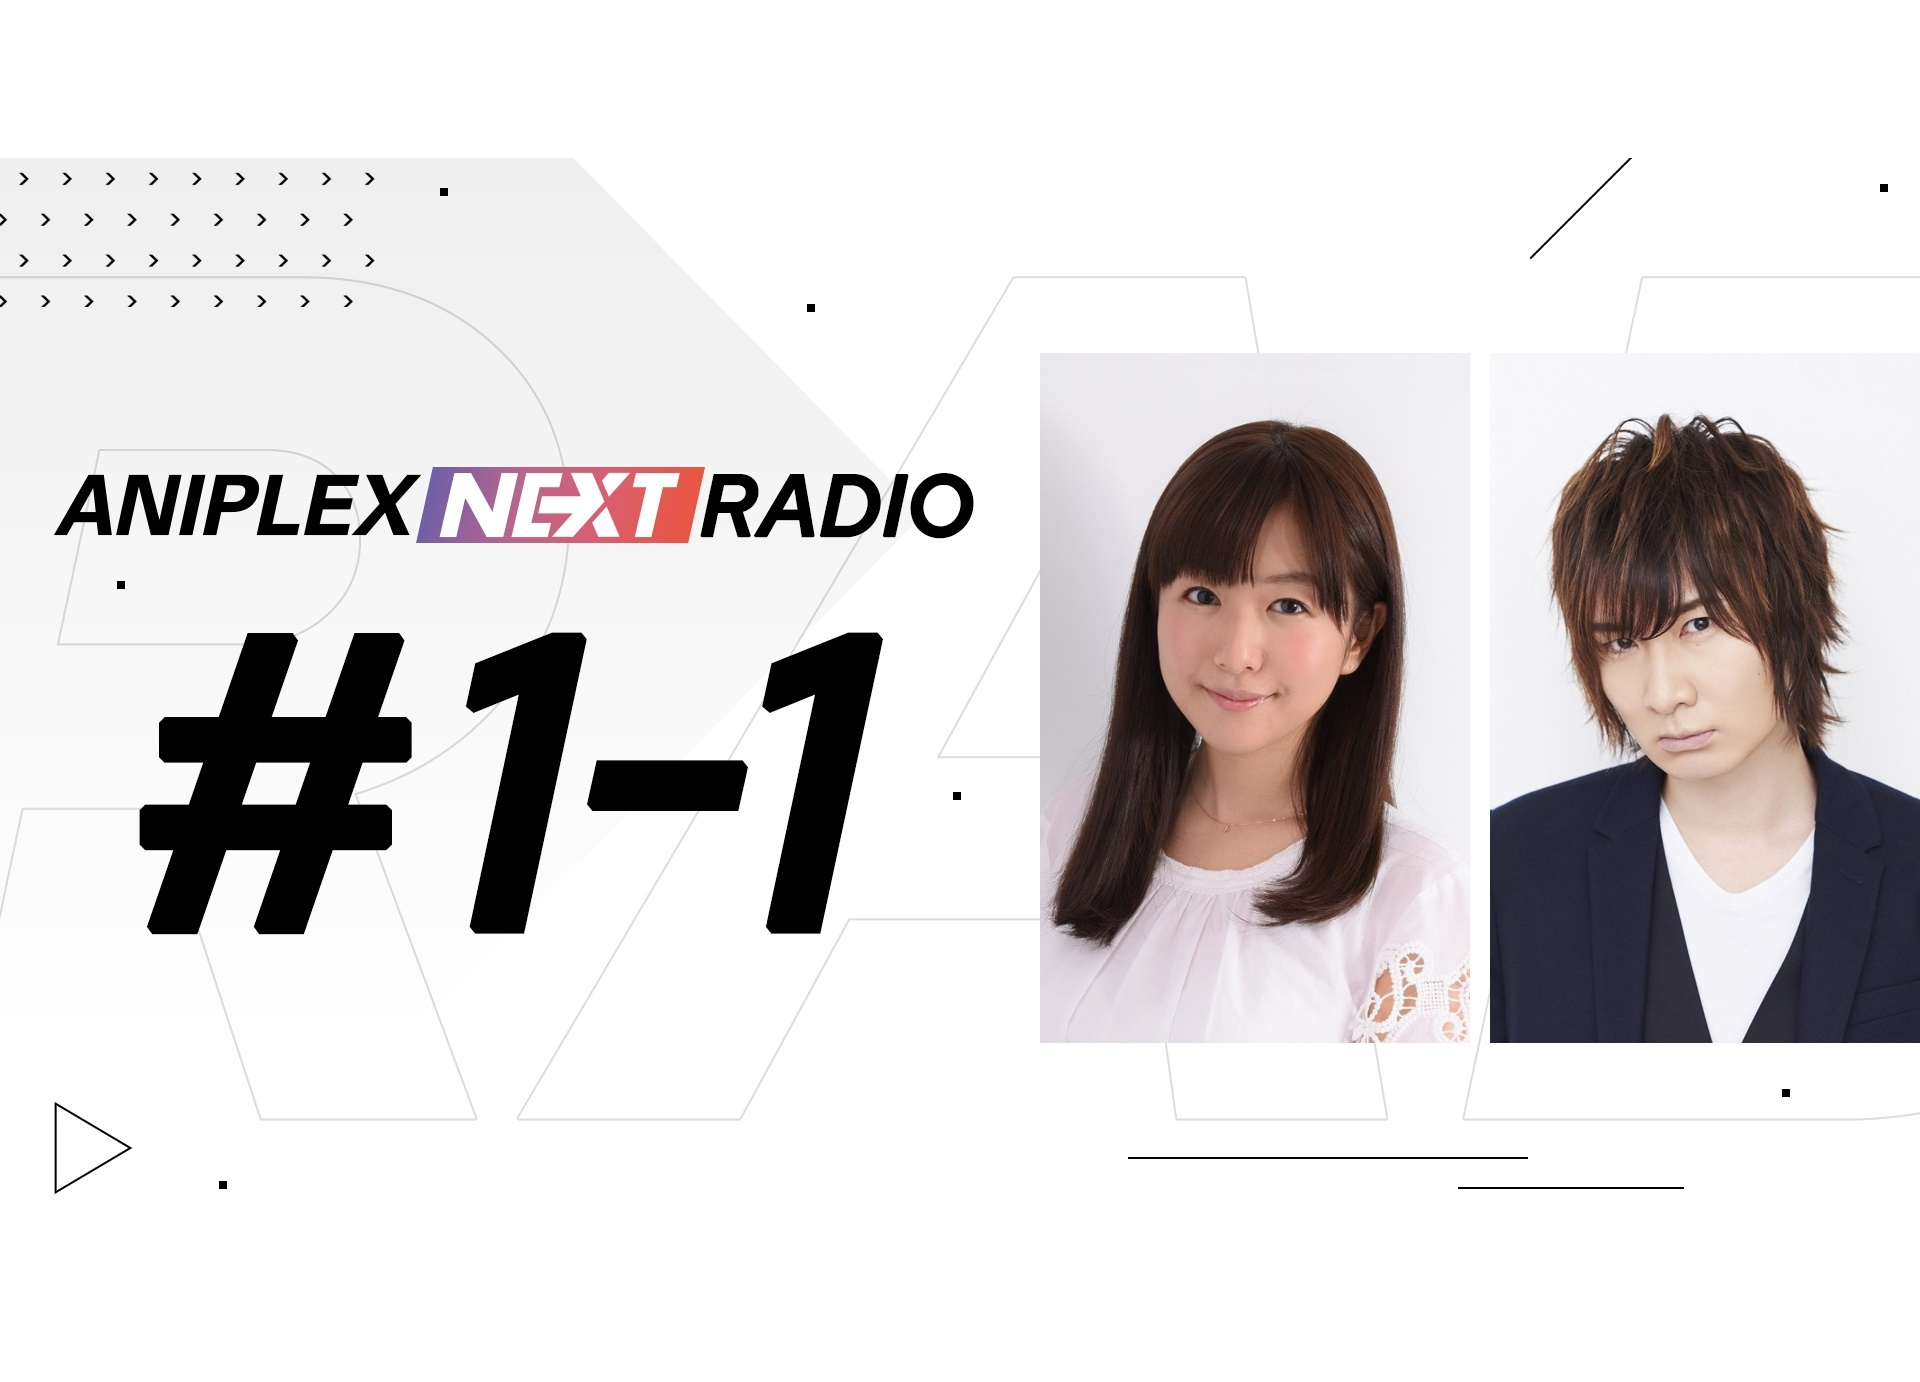 WEBラジオ『ANIPLEX NEXT RADIO』茅野愛衣&前野智昭が最新情報をお届け